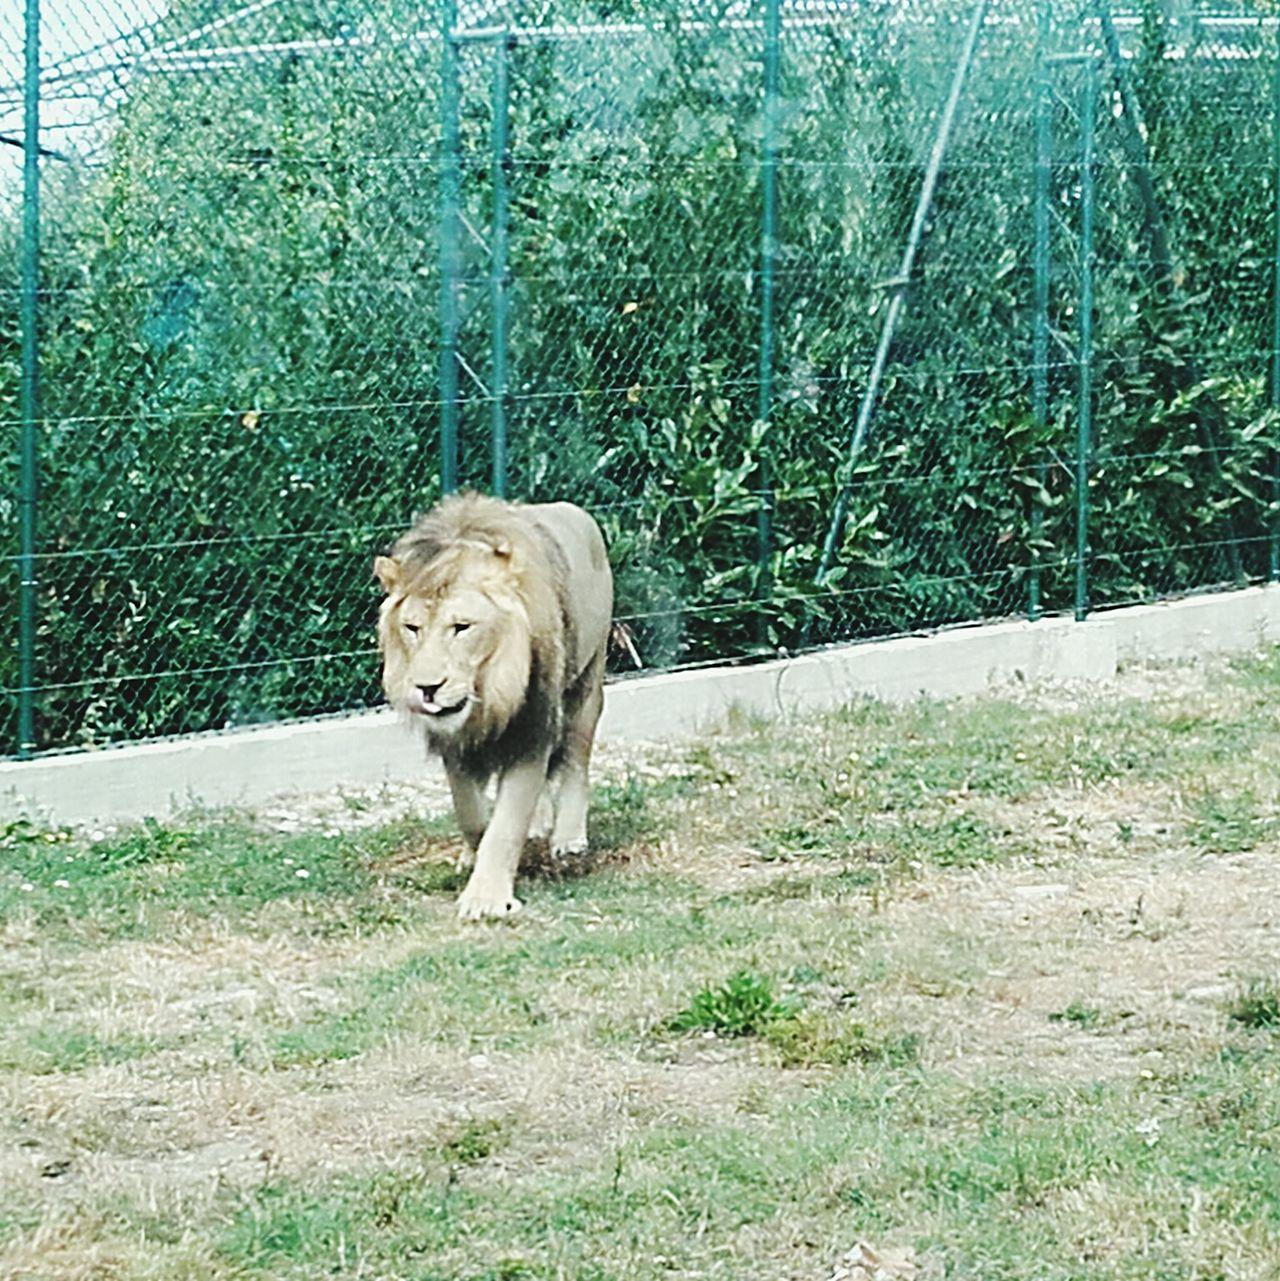 il re sei tuo Leone One Animal Animal Themes No People Nature Lion - Feline Lions Lion Leone Leones Zoo Animals In The Wild Animal Head  Animals